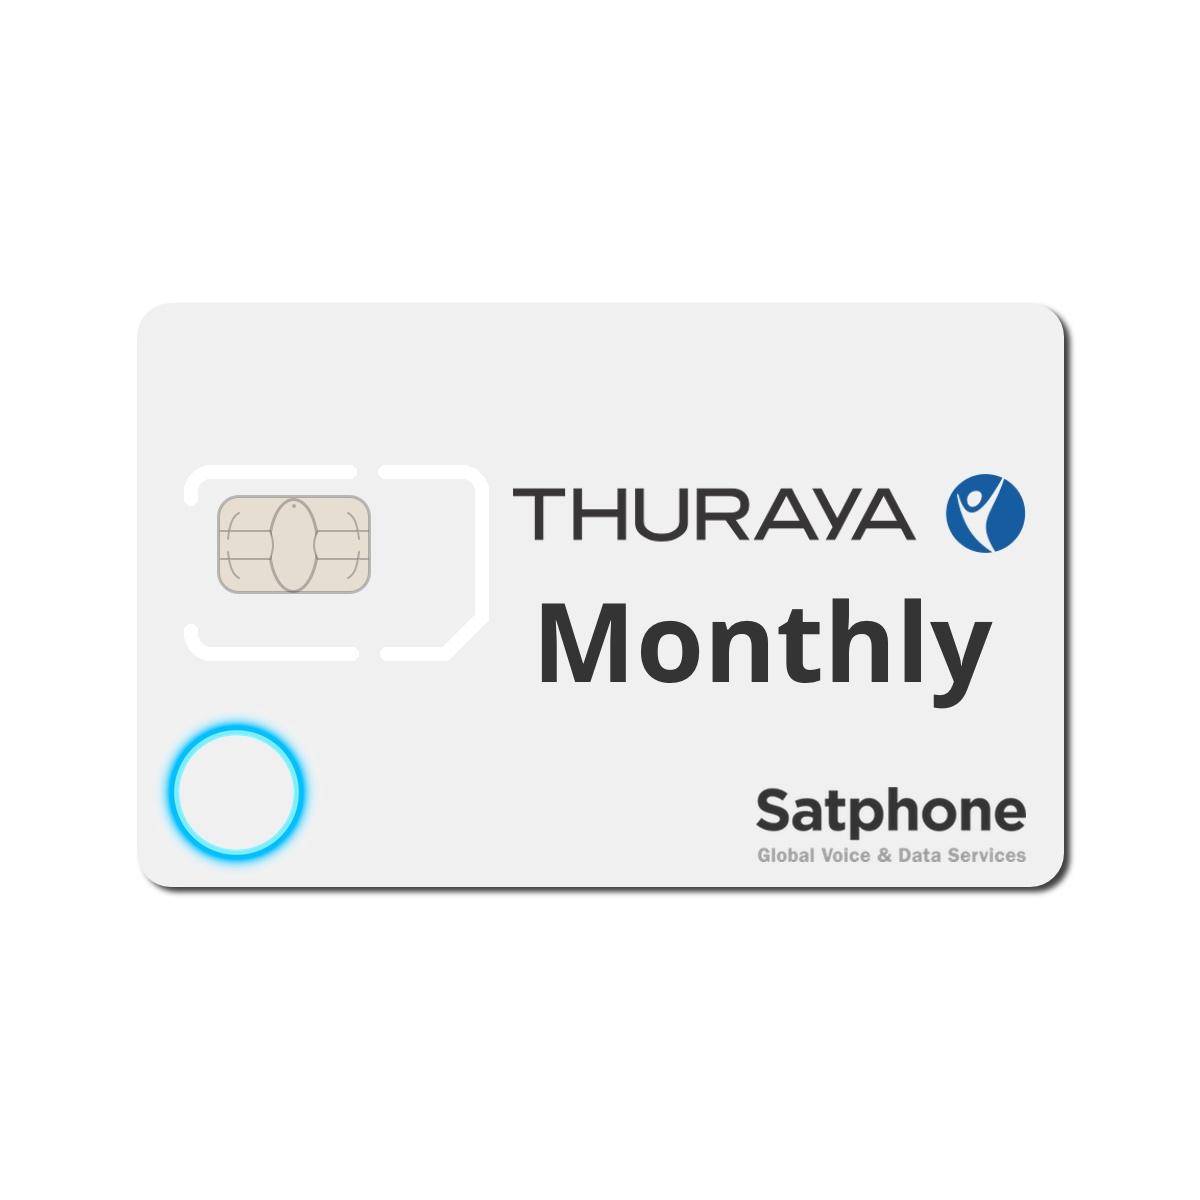 Thuraya Monthly SIM